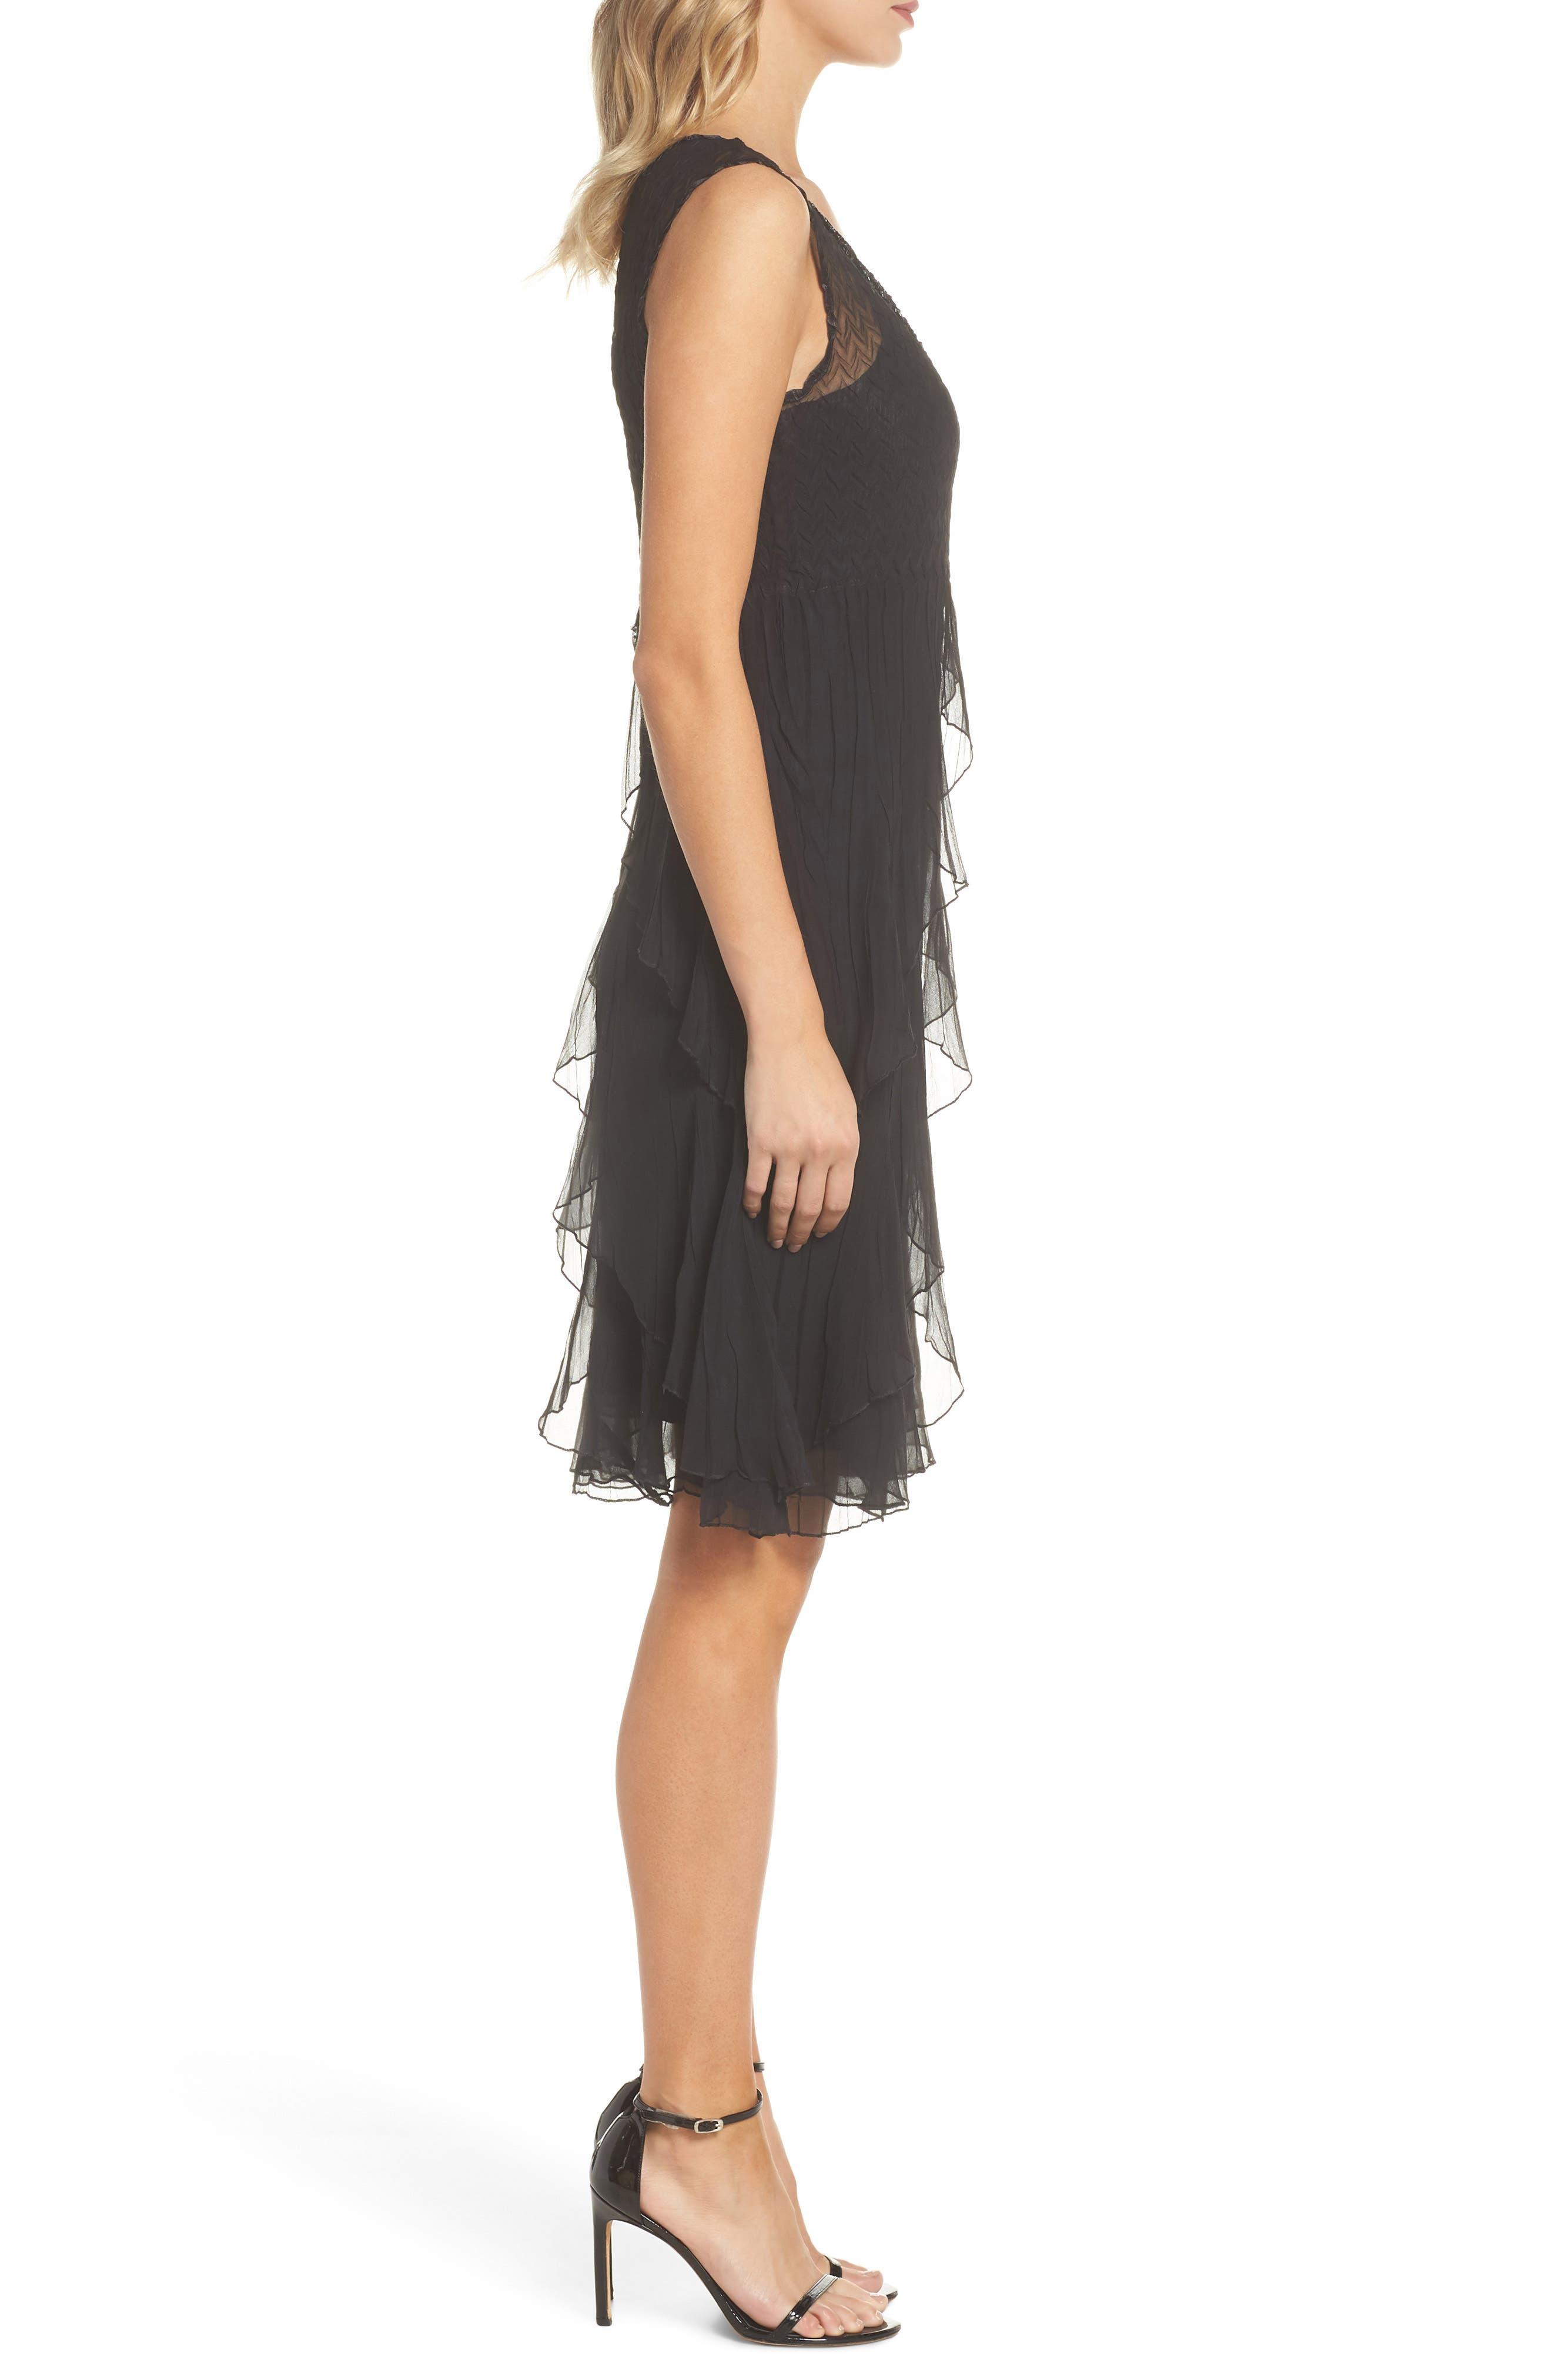 KOMAROV, Bead Trim Chiffon Dress with Wrap, Alternate thumbnail 4, color, BLACK